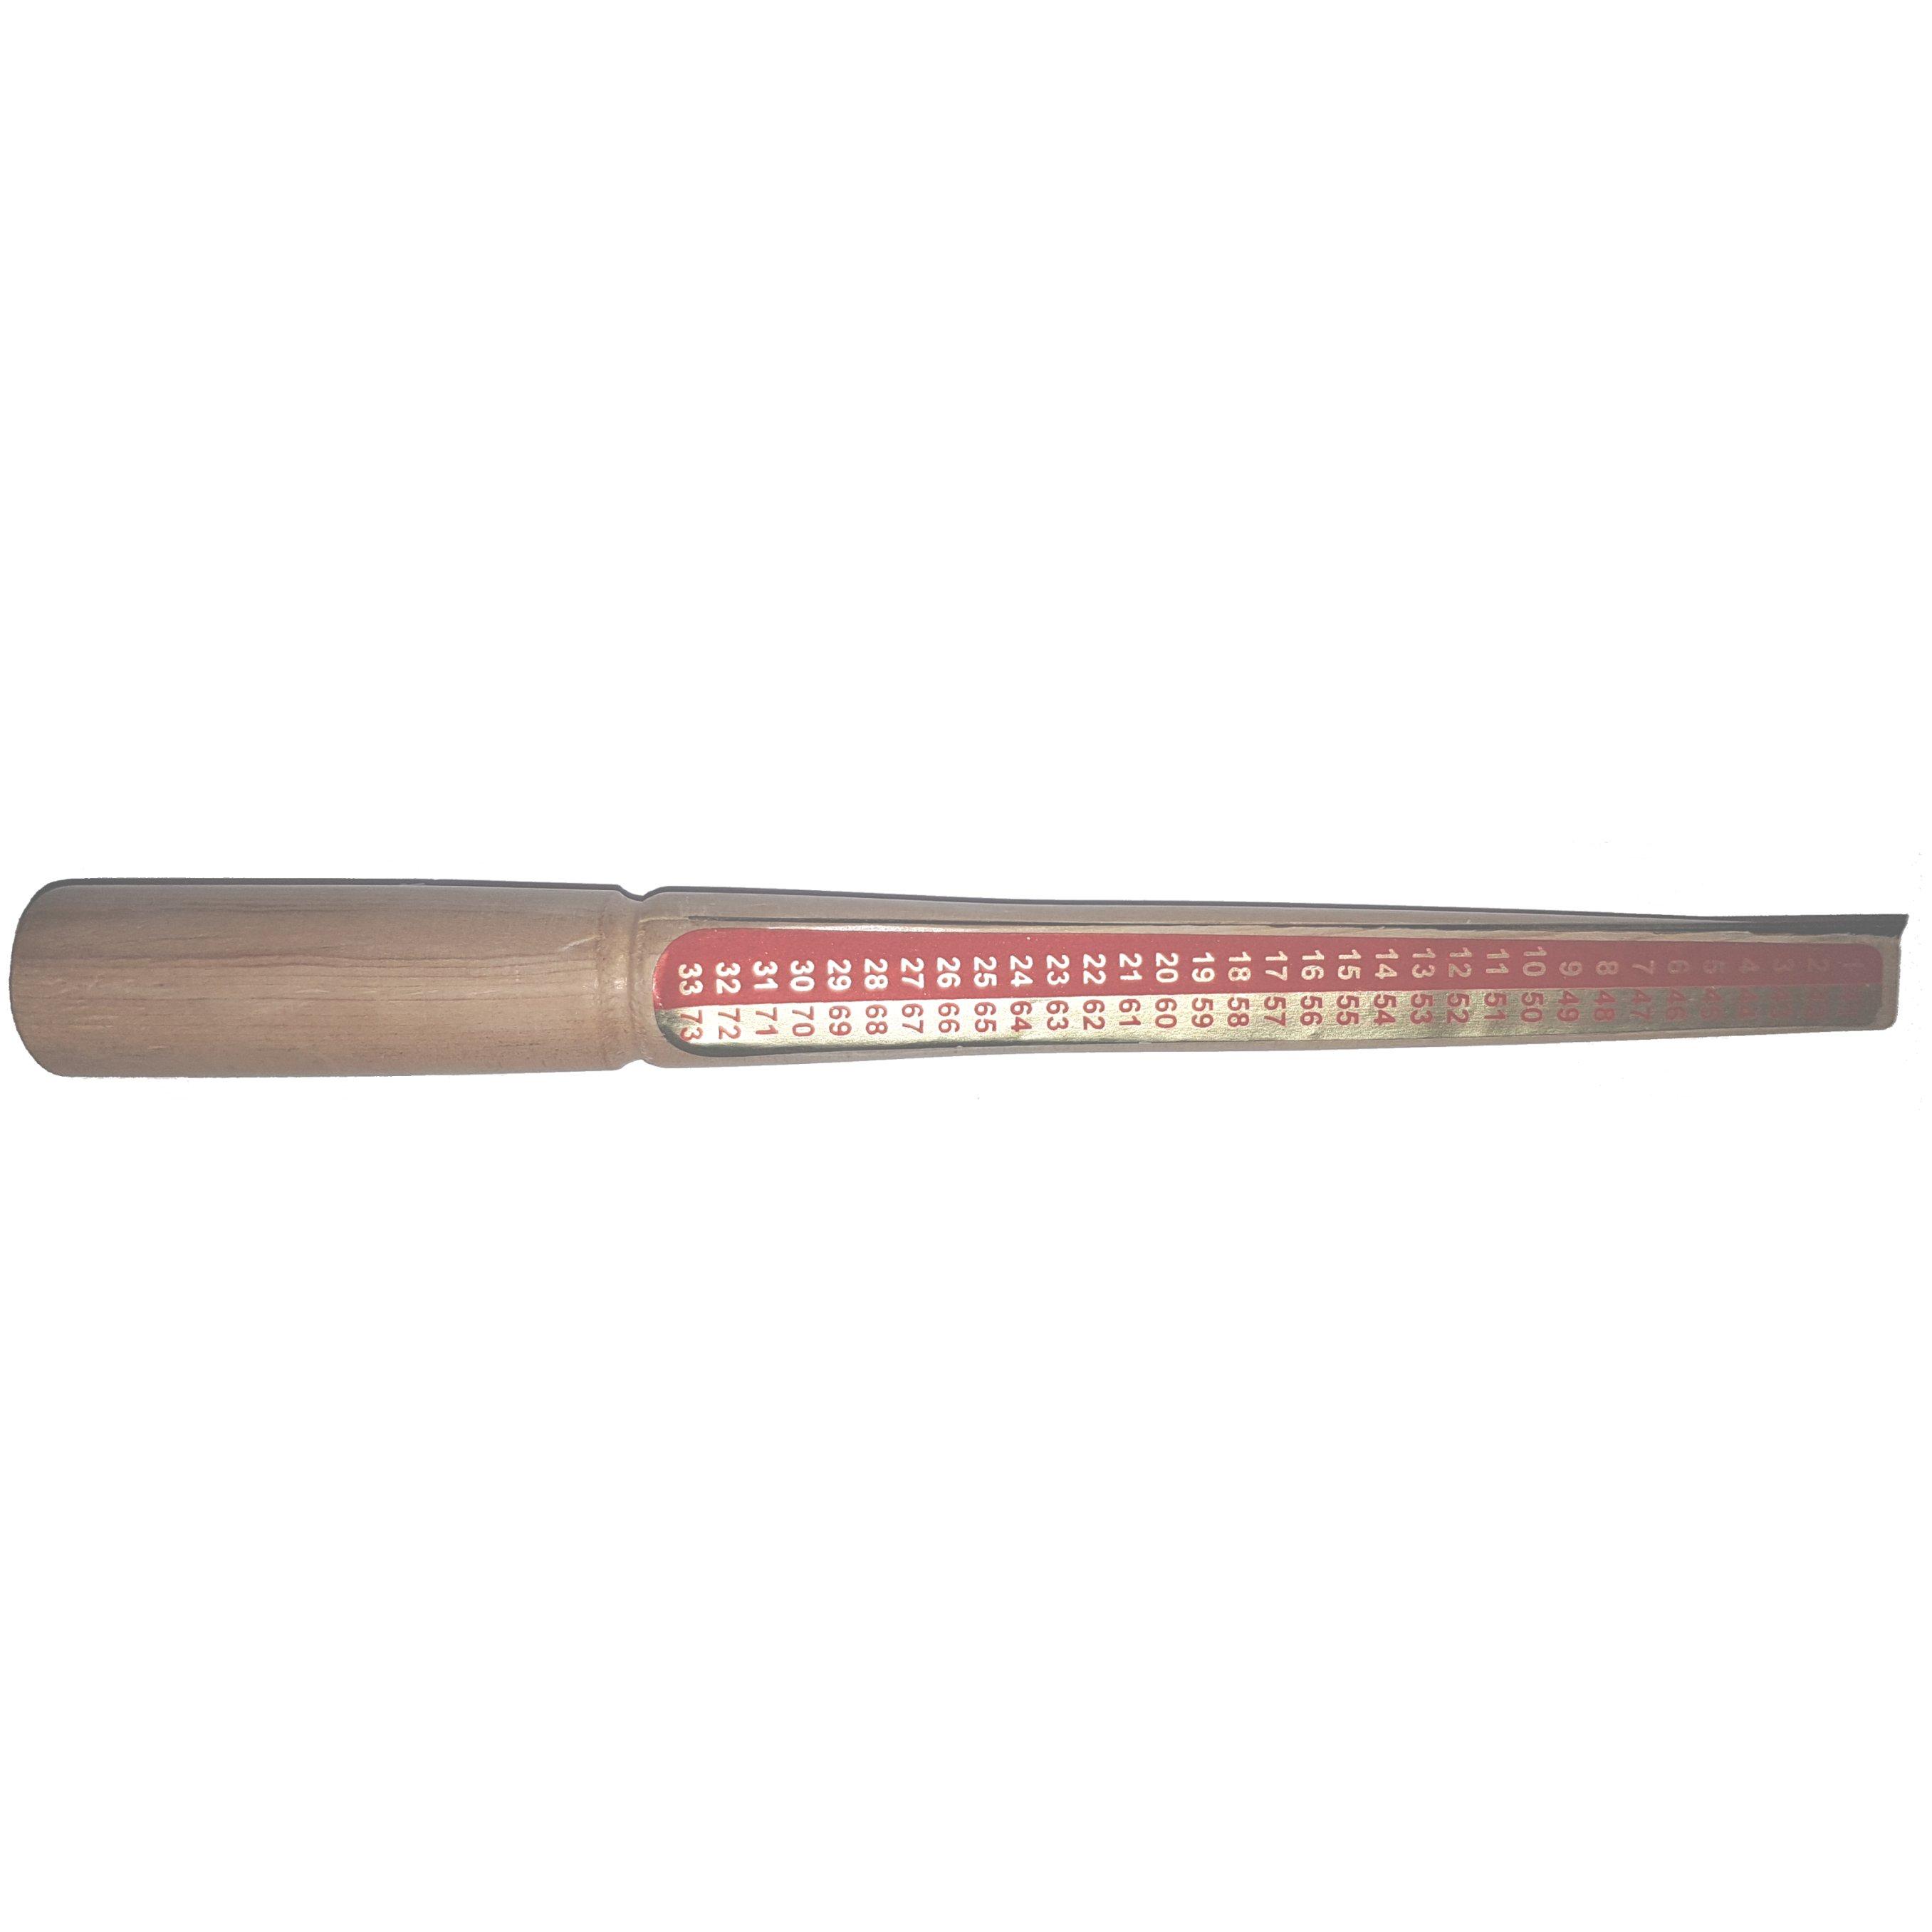 8€ Palo de medida p/anillos cera con cuchilla